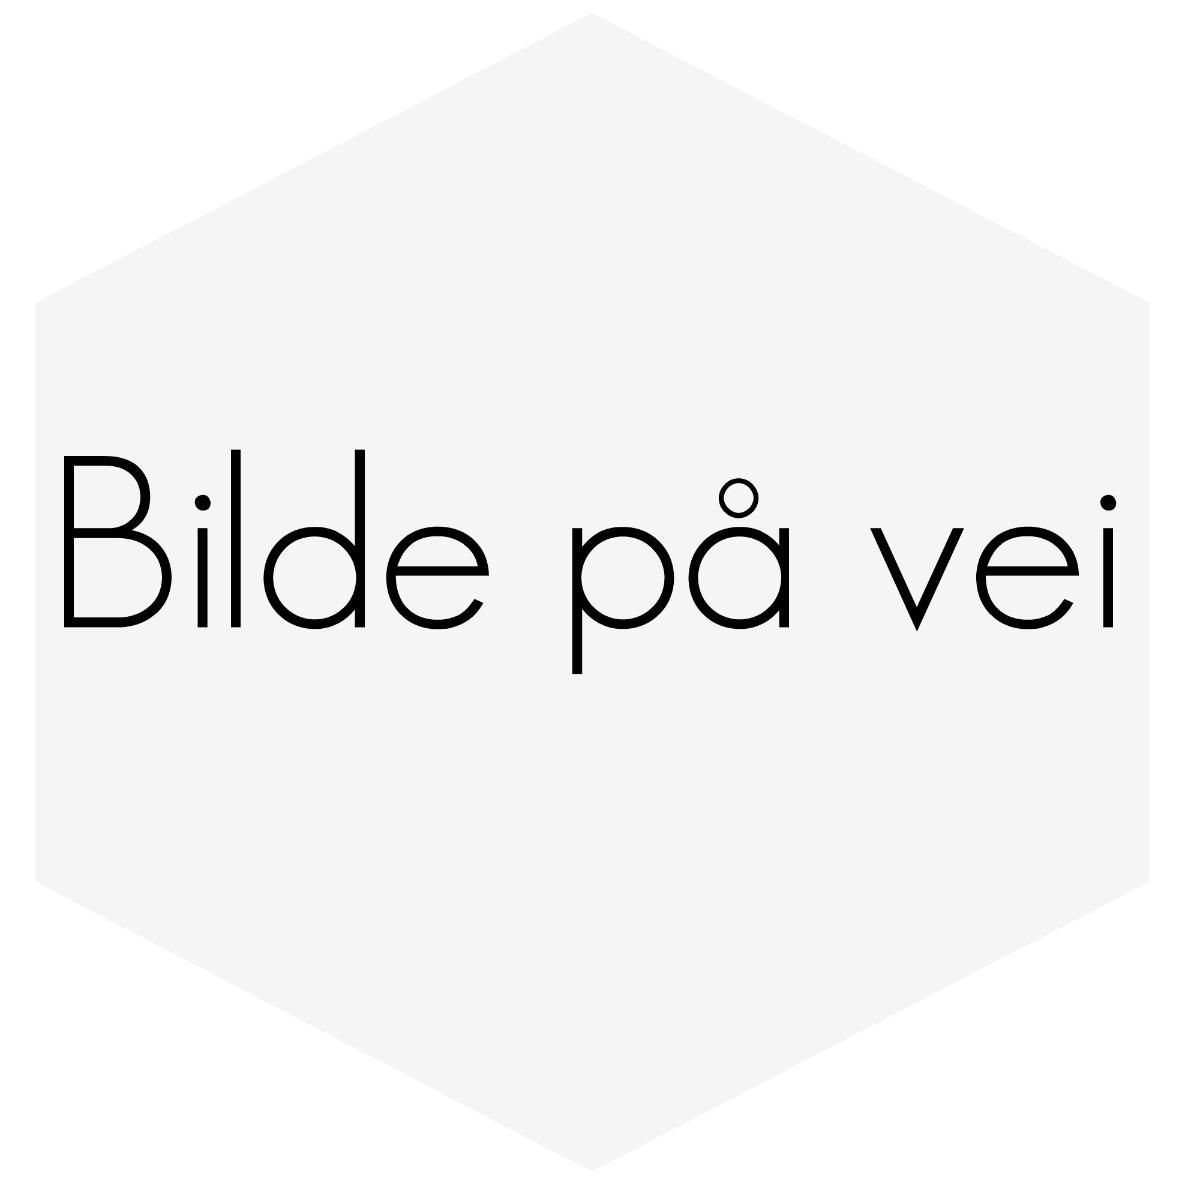 BREMSEBÅND FORAN PV/DUETT 1959-1968 275846